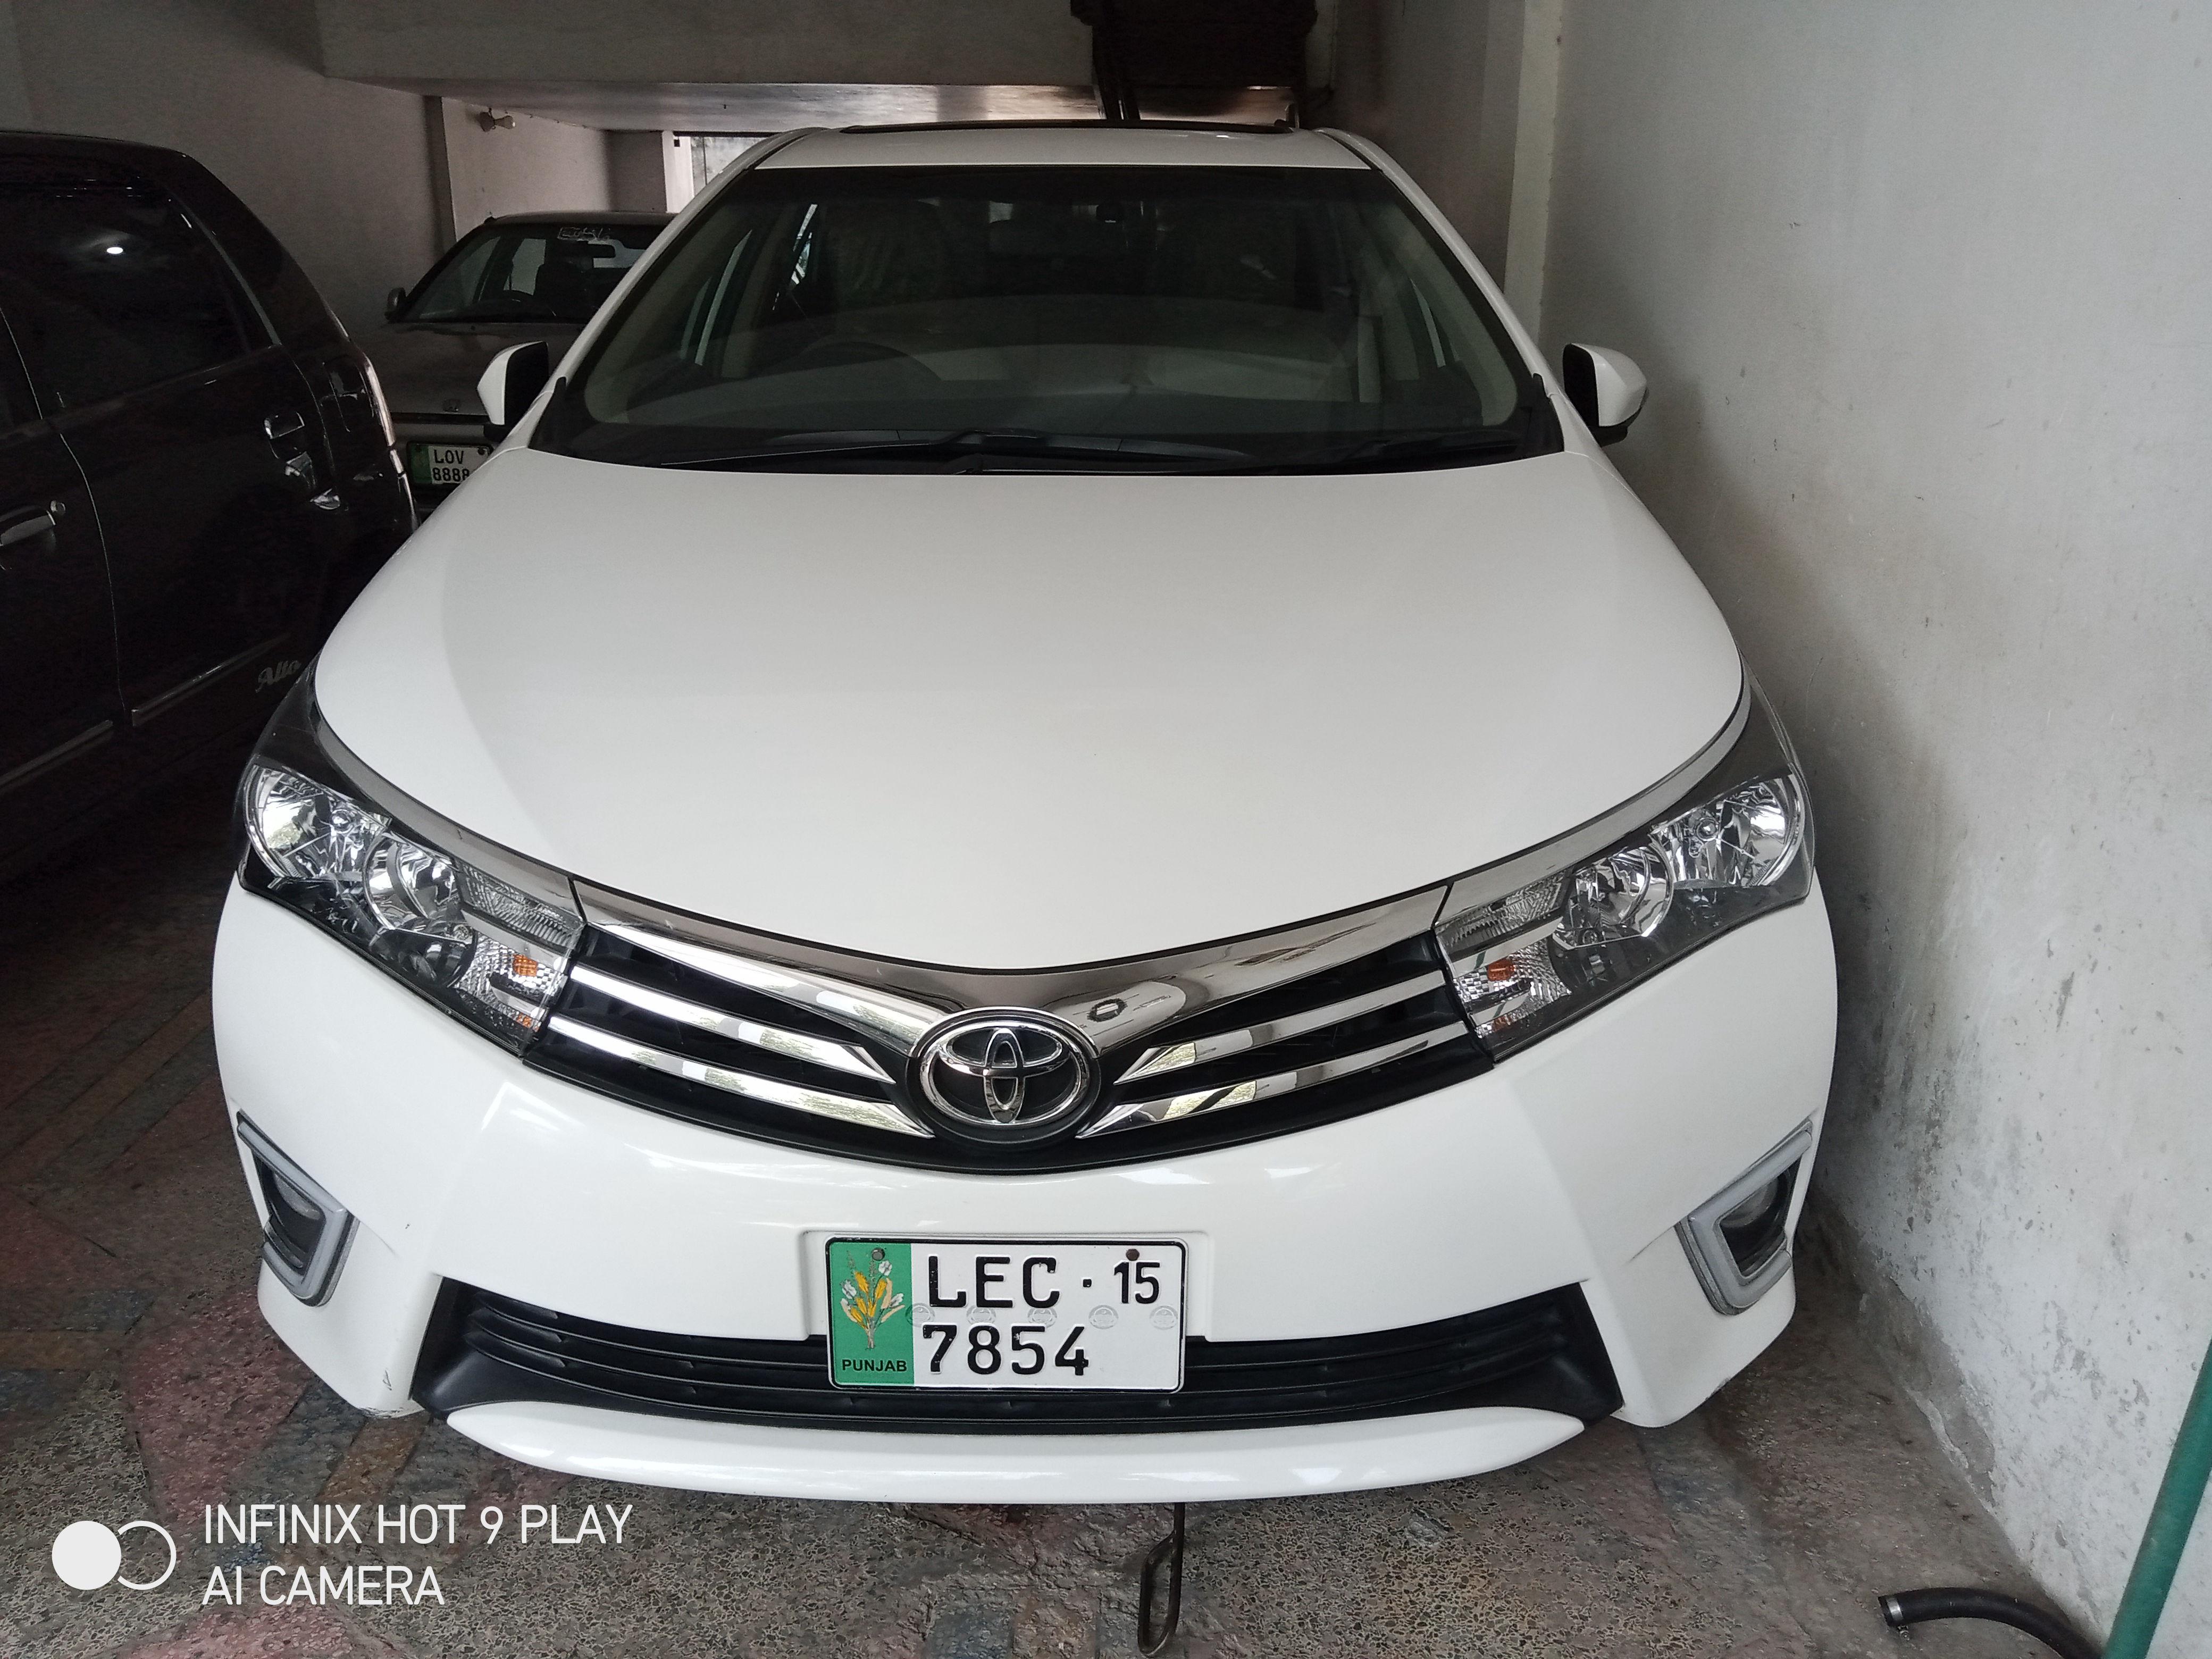 Toyota Corolla Altis Grande CVT-i 1.8 2015